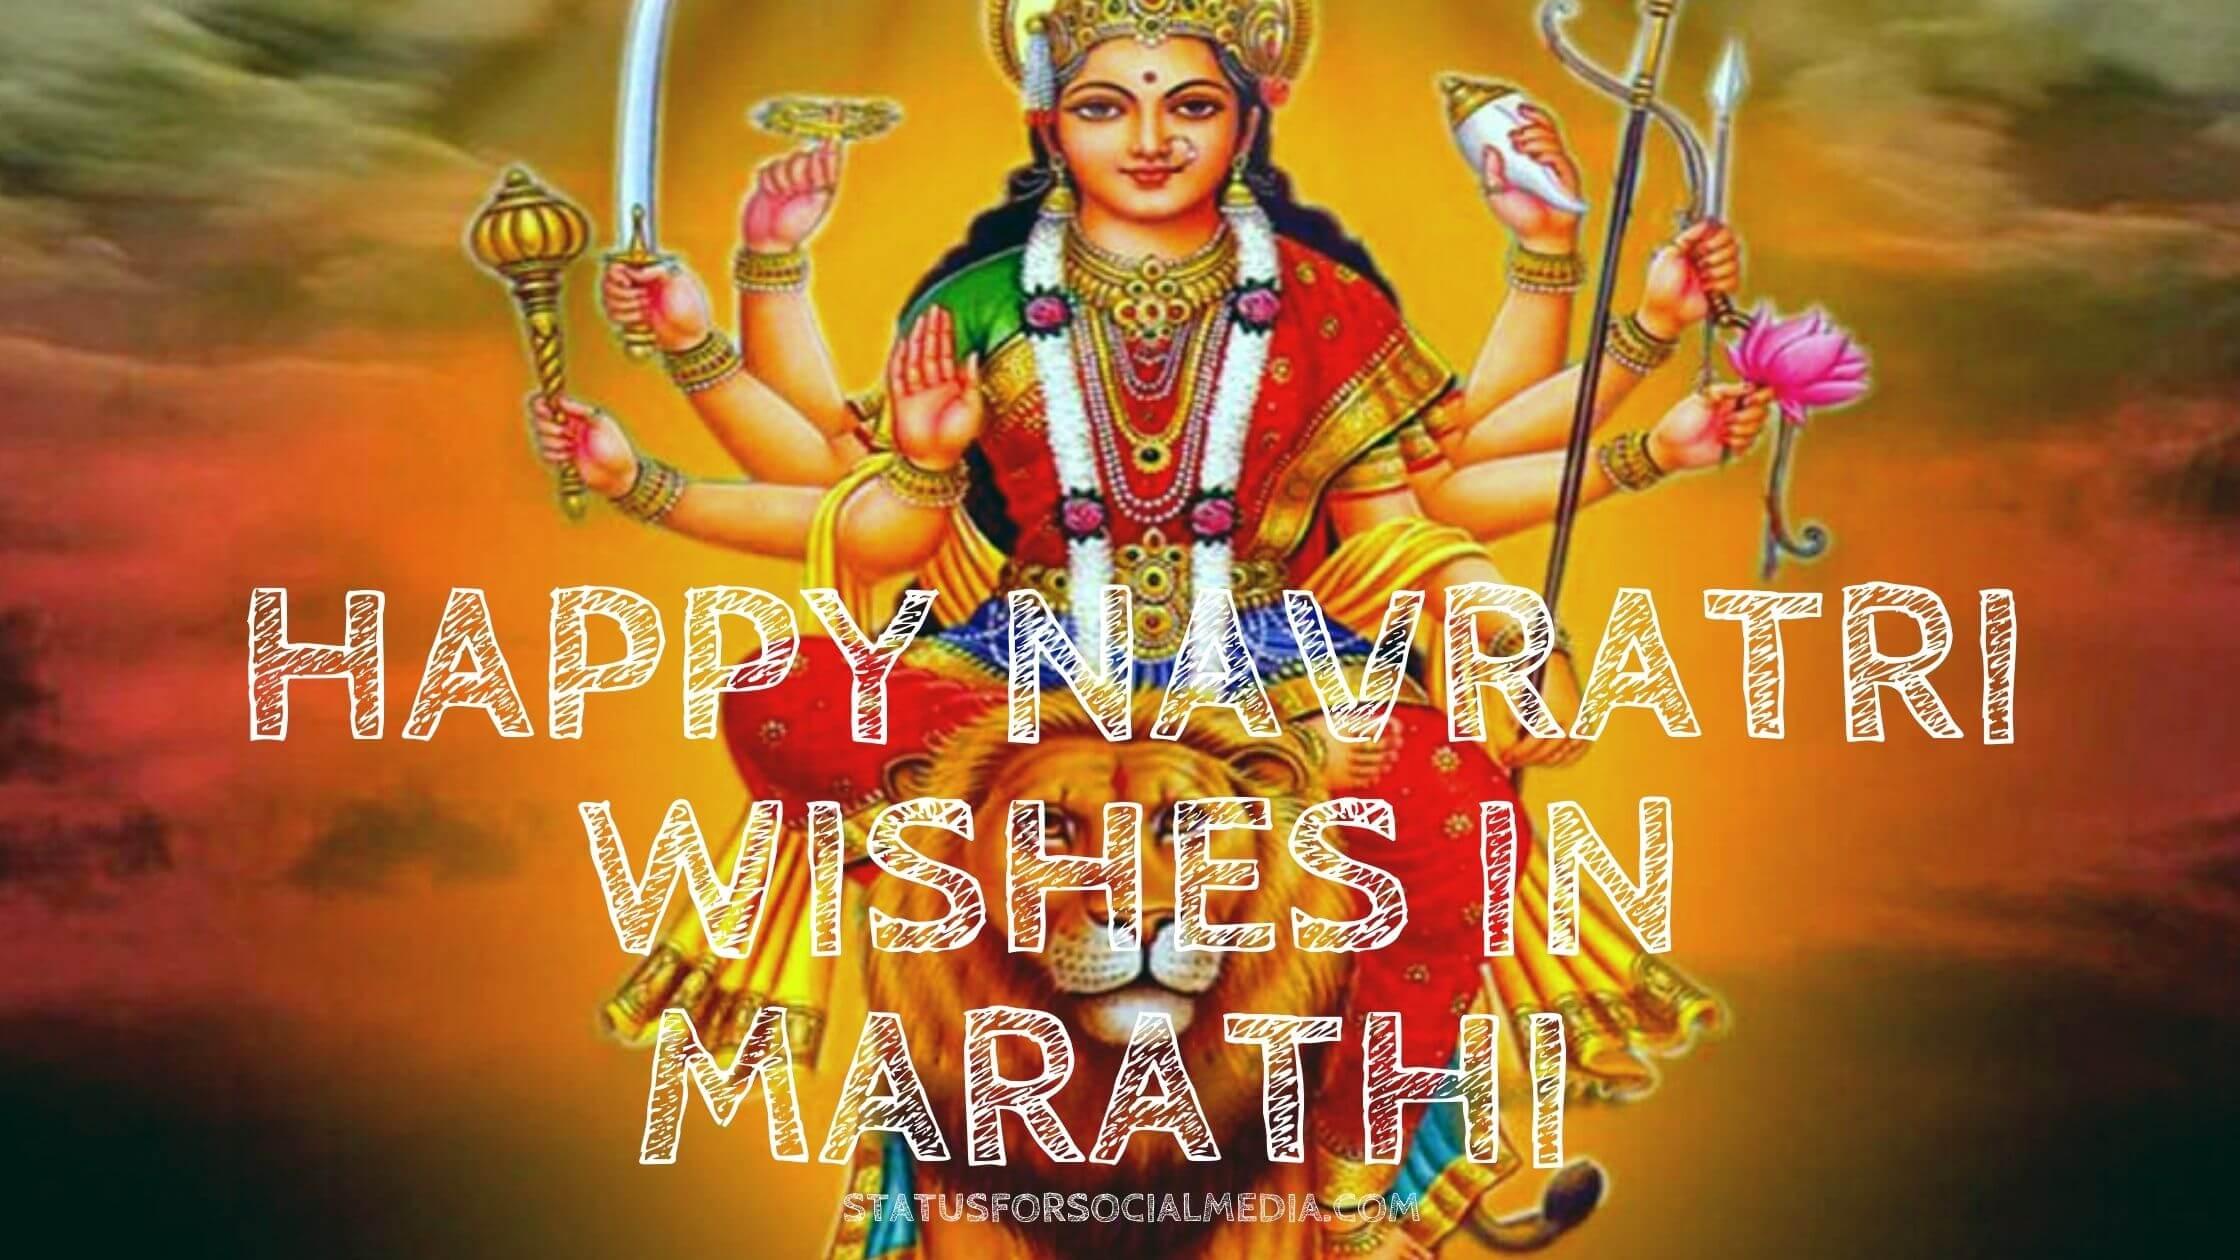 Happy Navratri Wishes In Marathi 2020